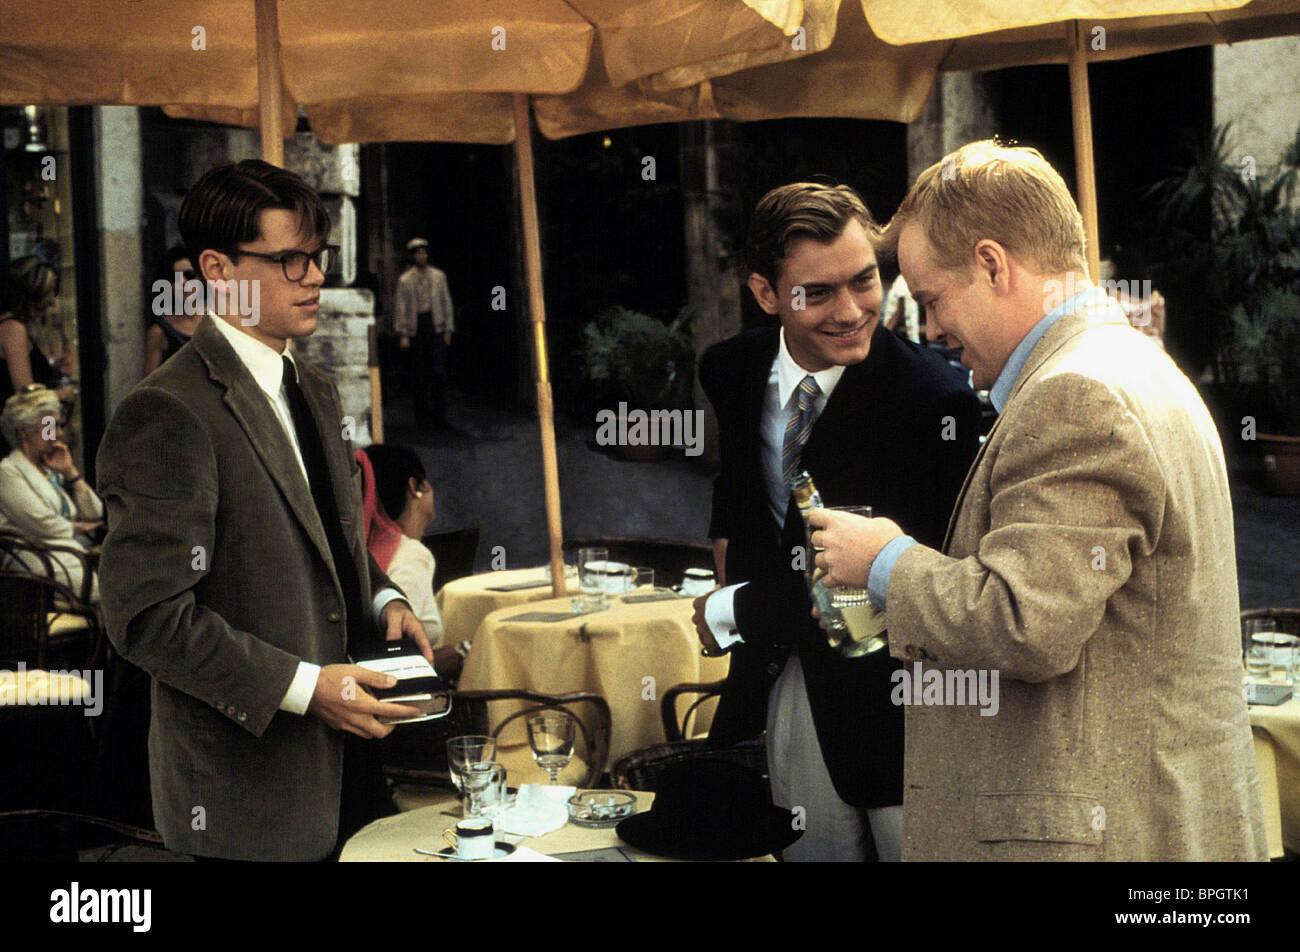 MATT DAMON, Jude Law, Philip Seymour Hoffman, Le talentueux Mr Ripley, 1999 Photo Stock